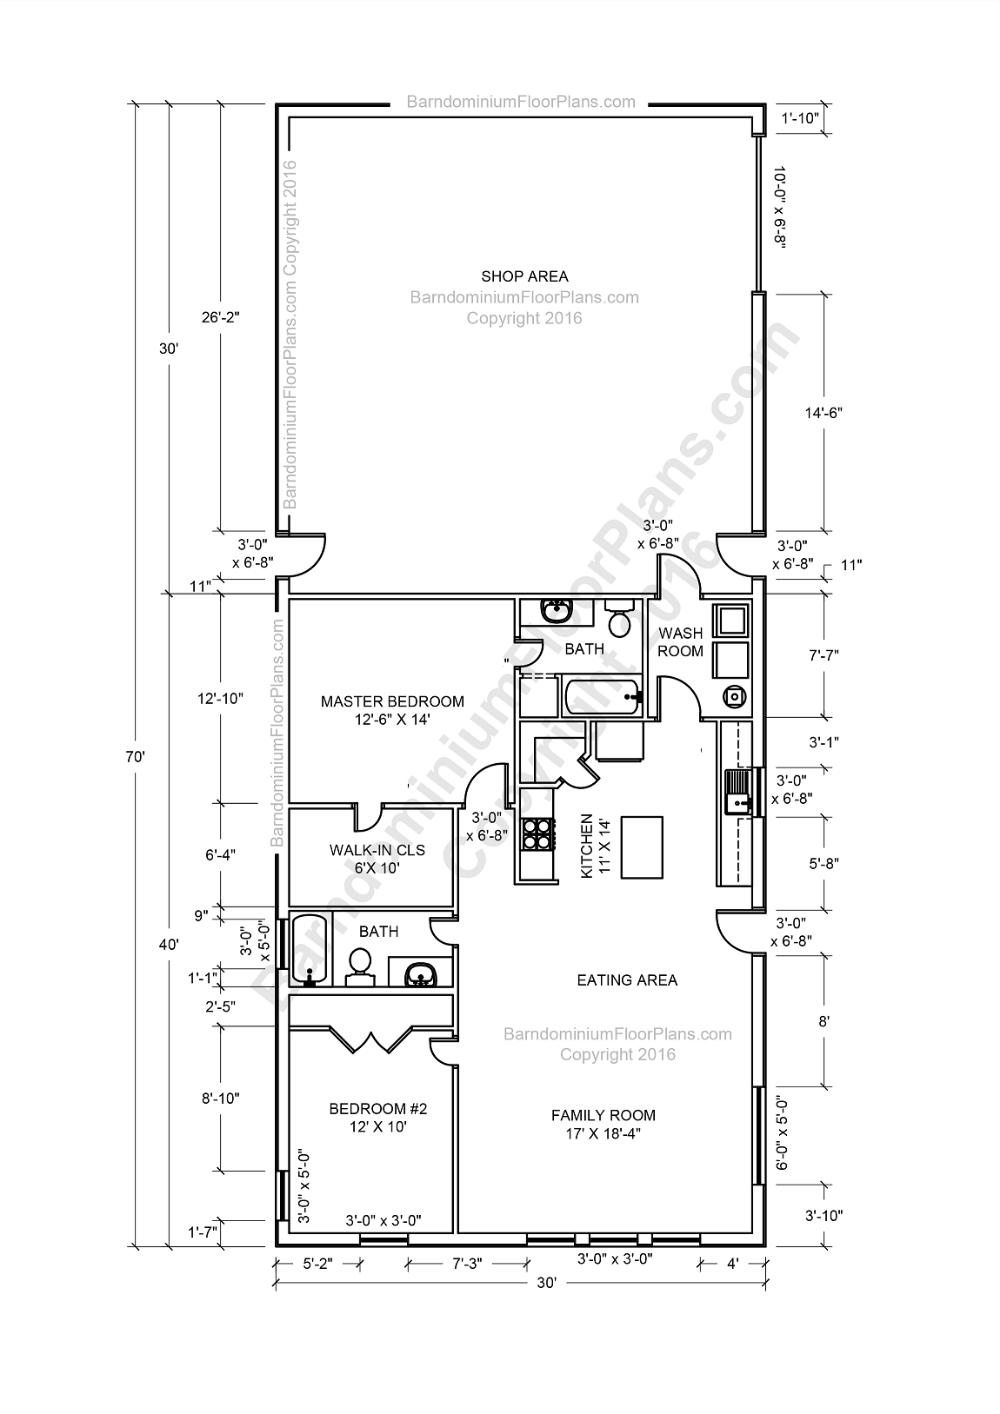 Barndominium Floor Plans, Pole Barn House Plans and Metal Barn Homes | Barndominium Designs #barndominiumideasfloorplans